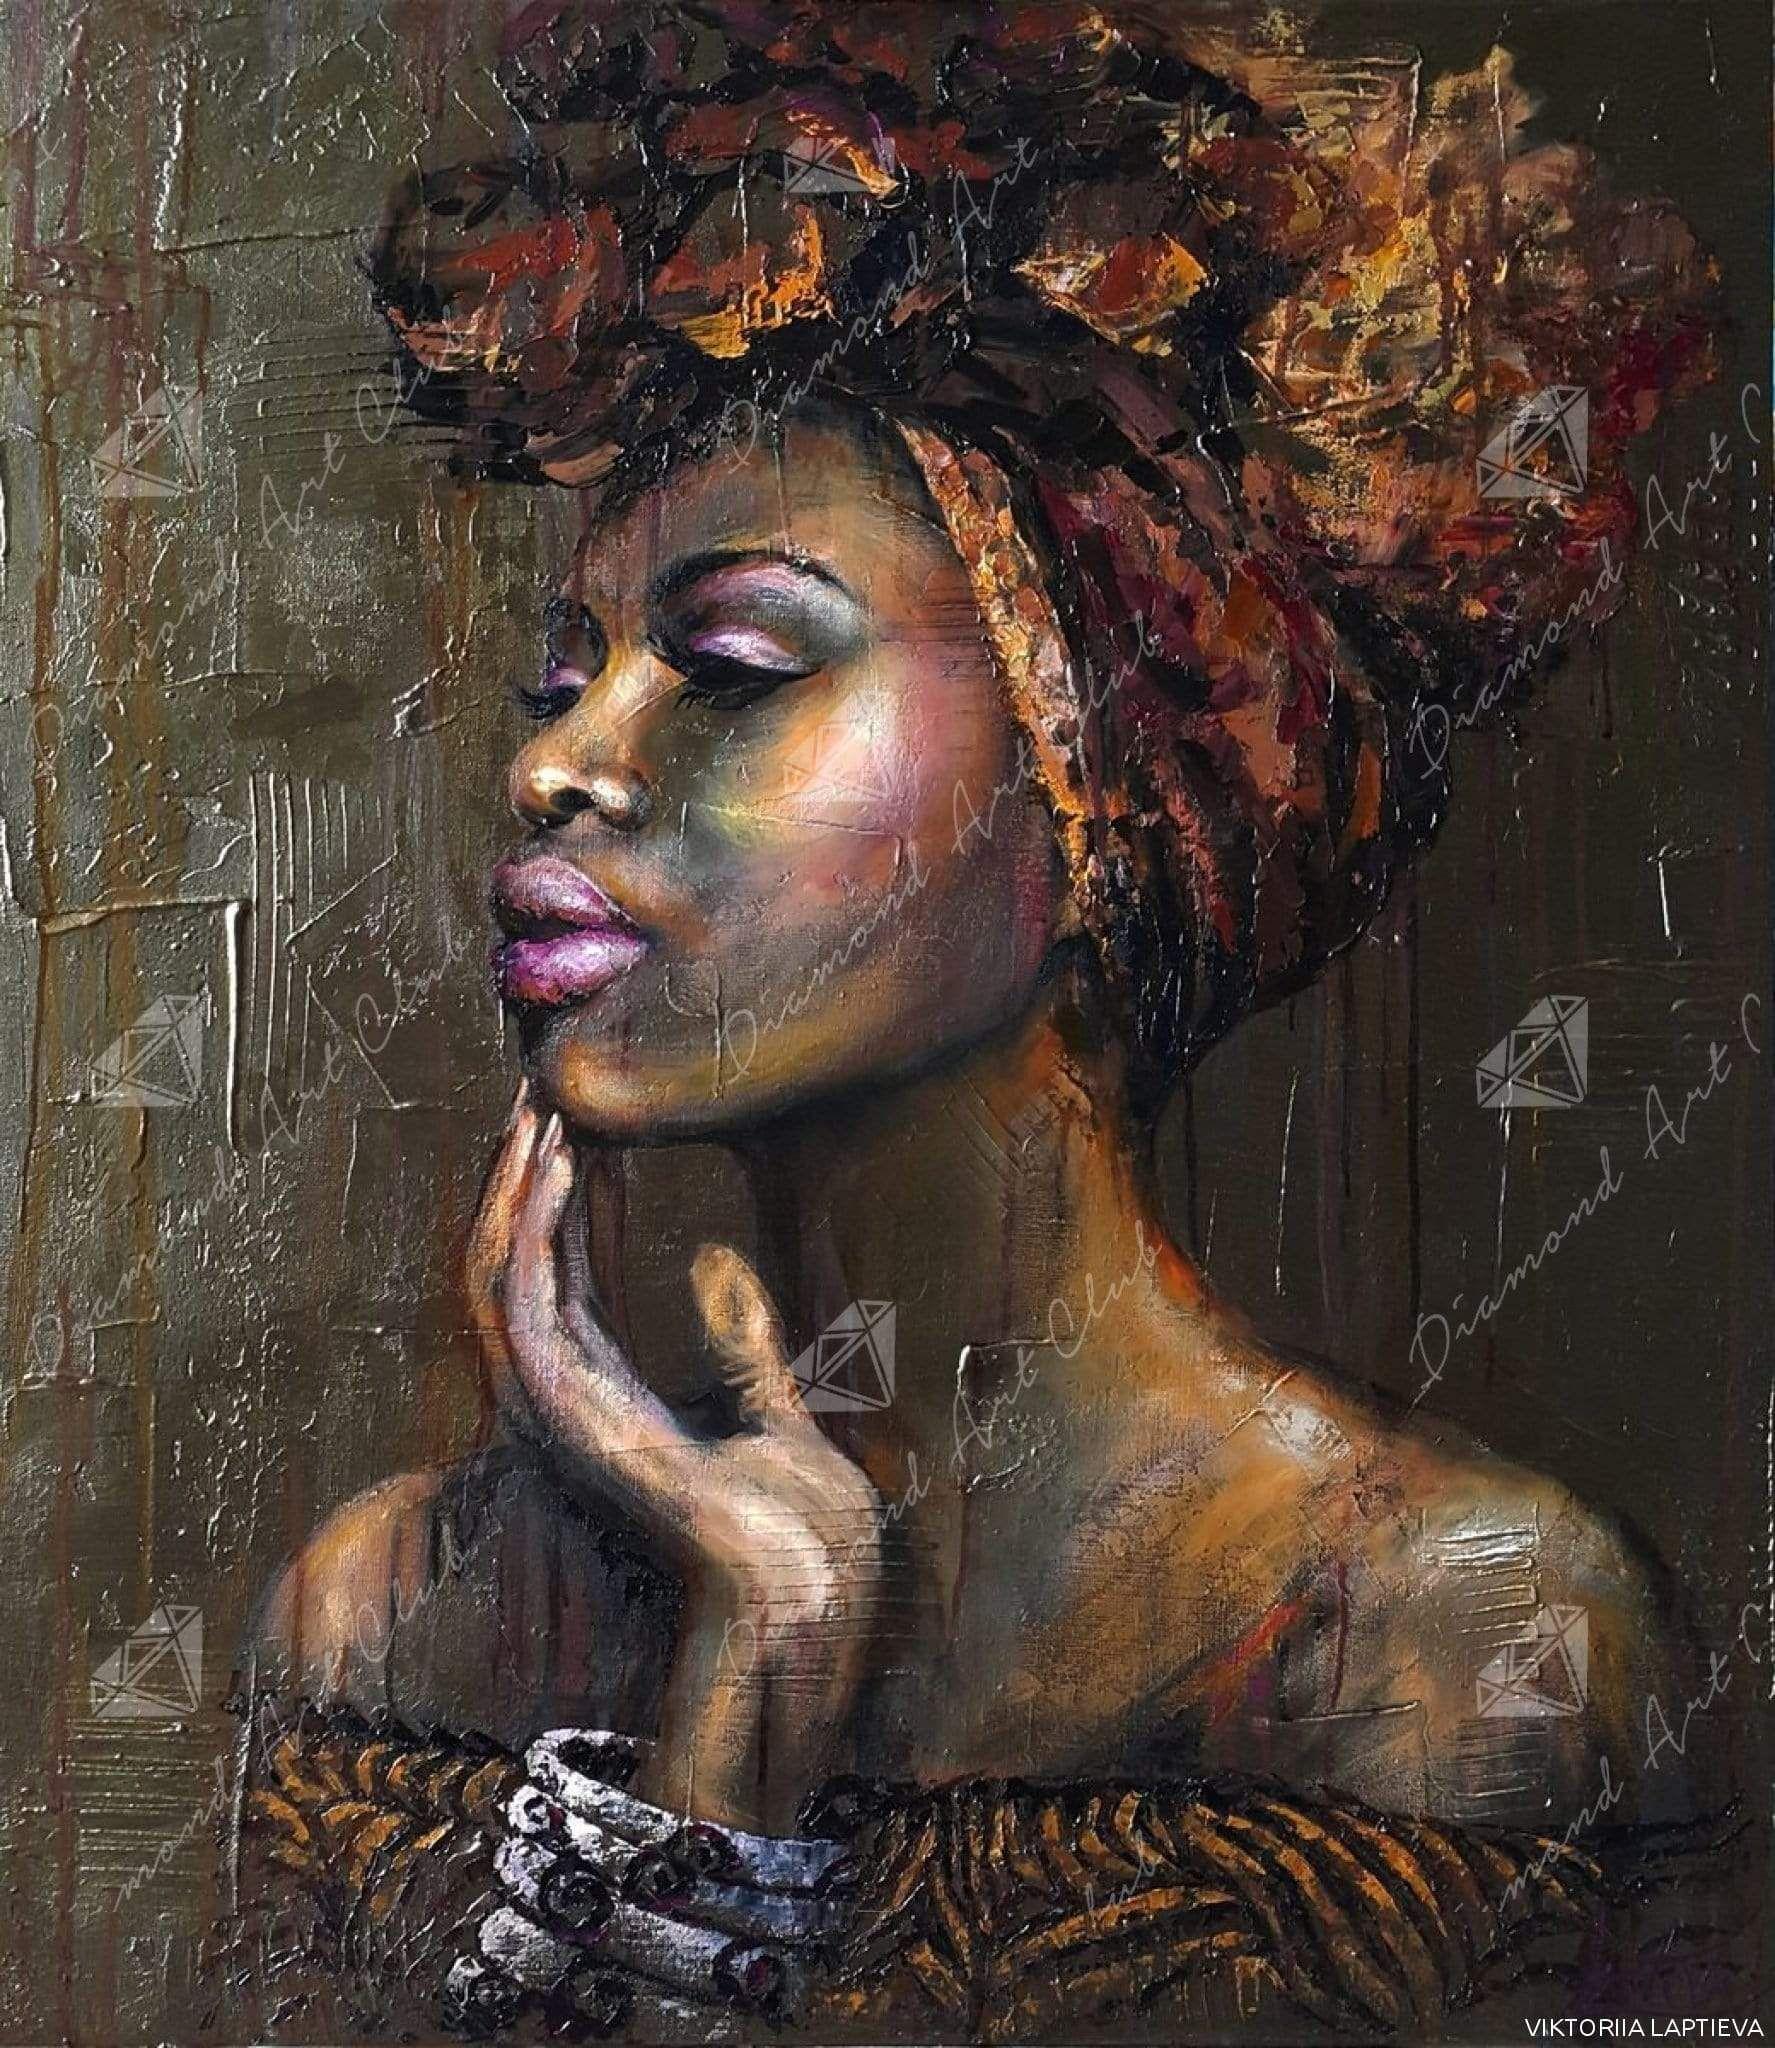 Pin on African art - Bamileke